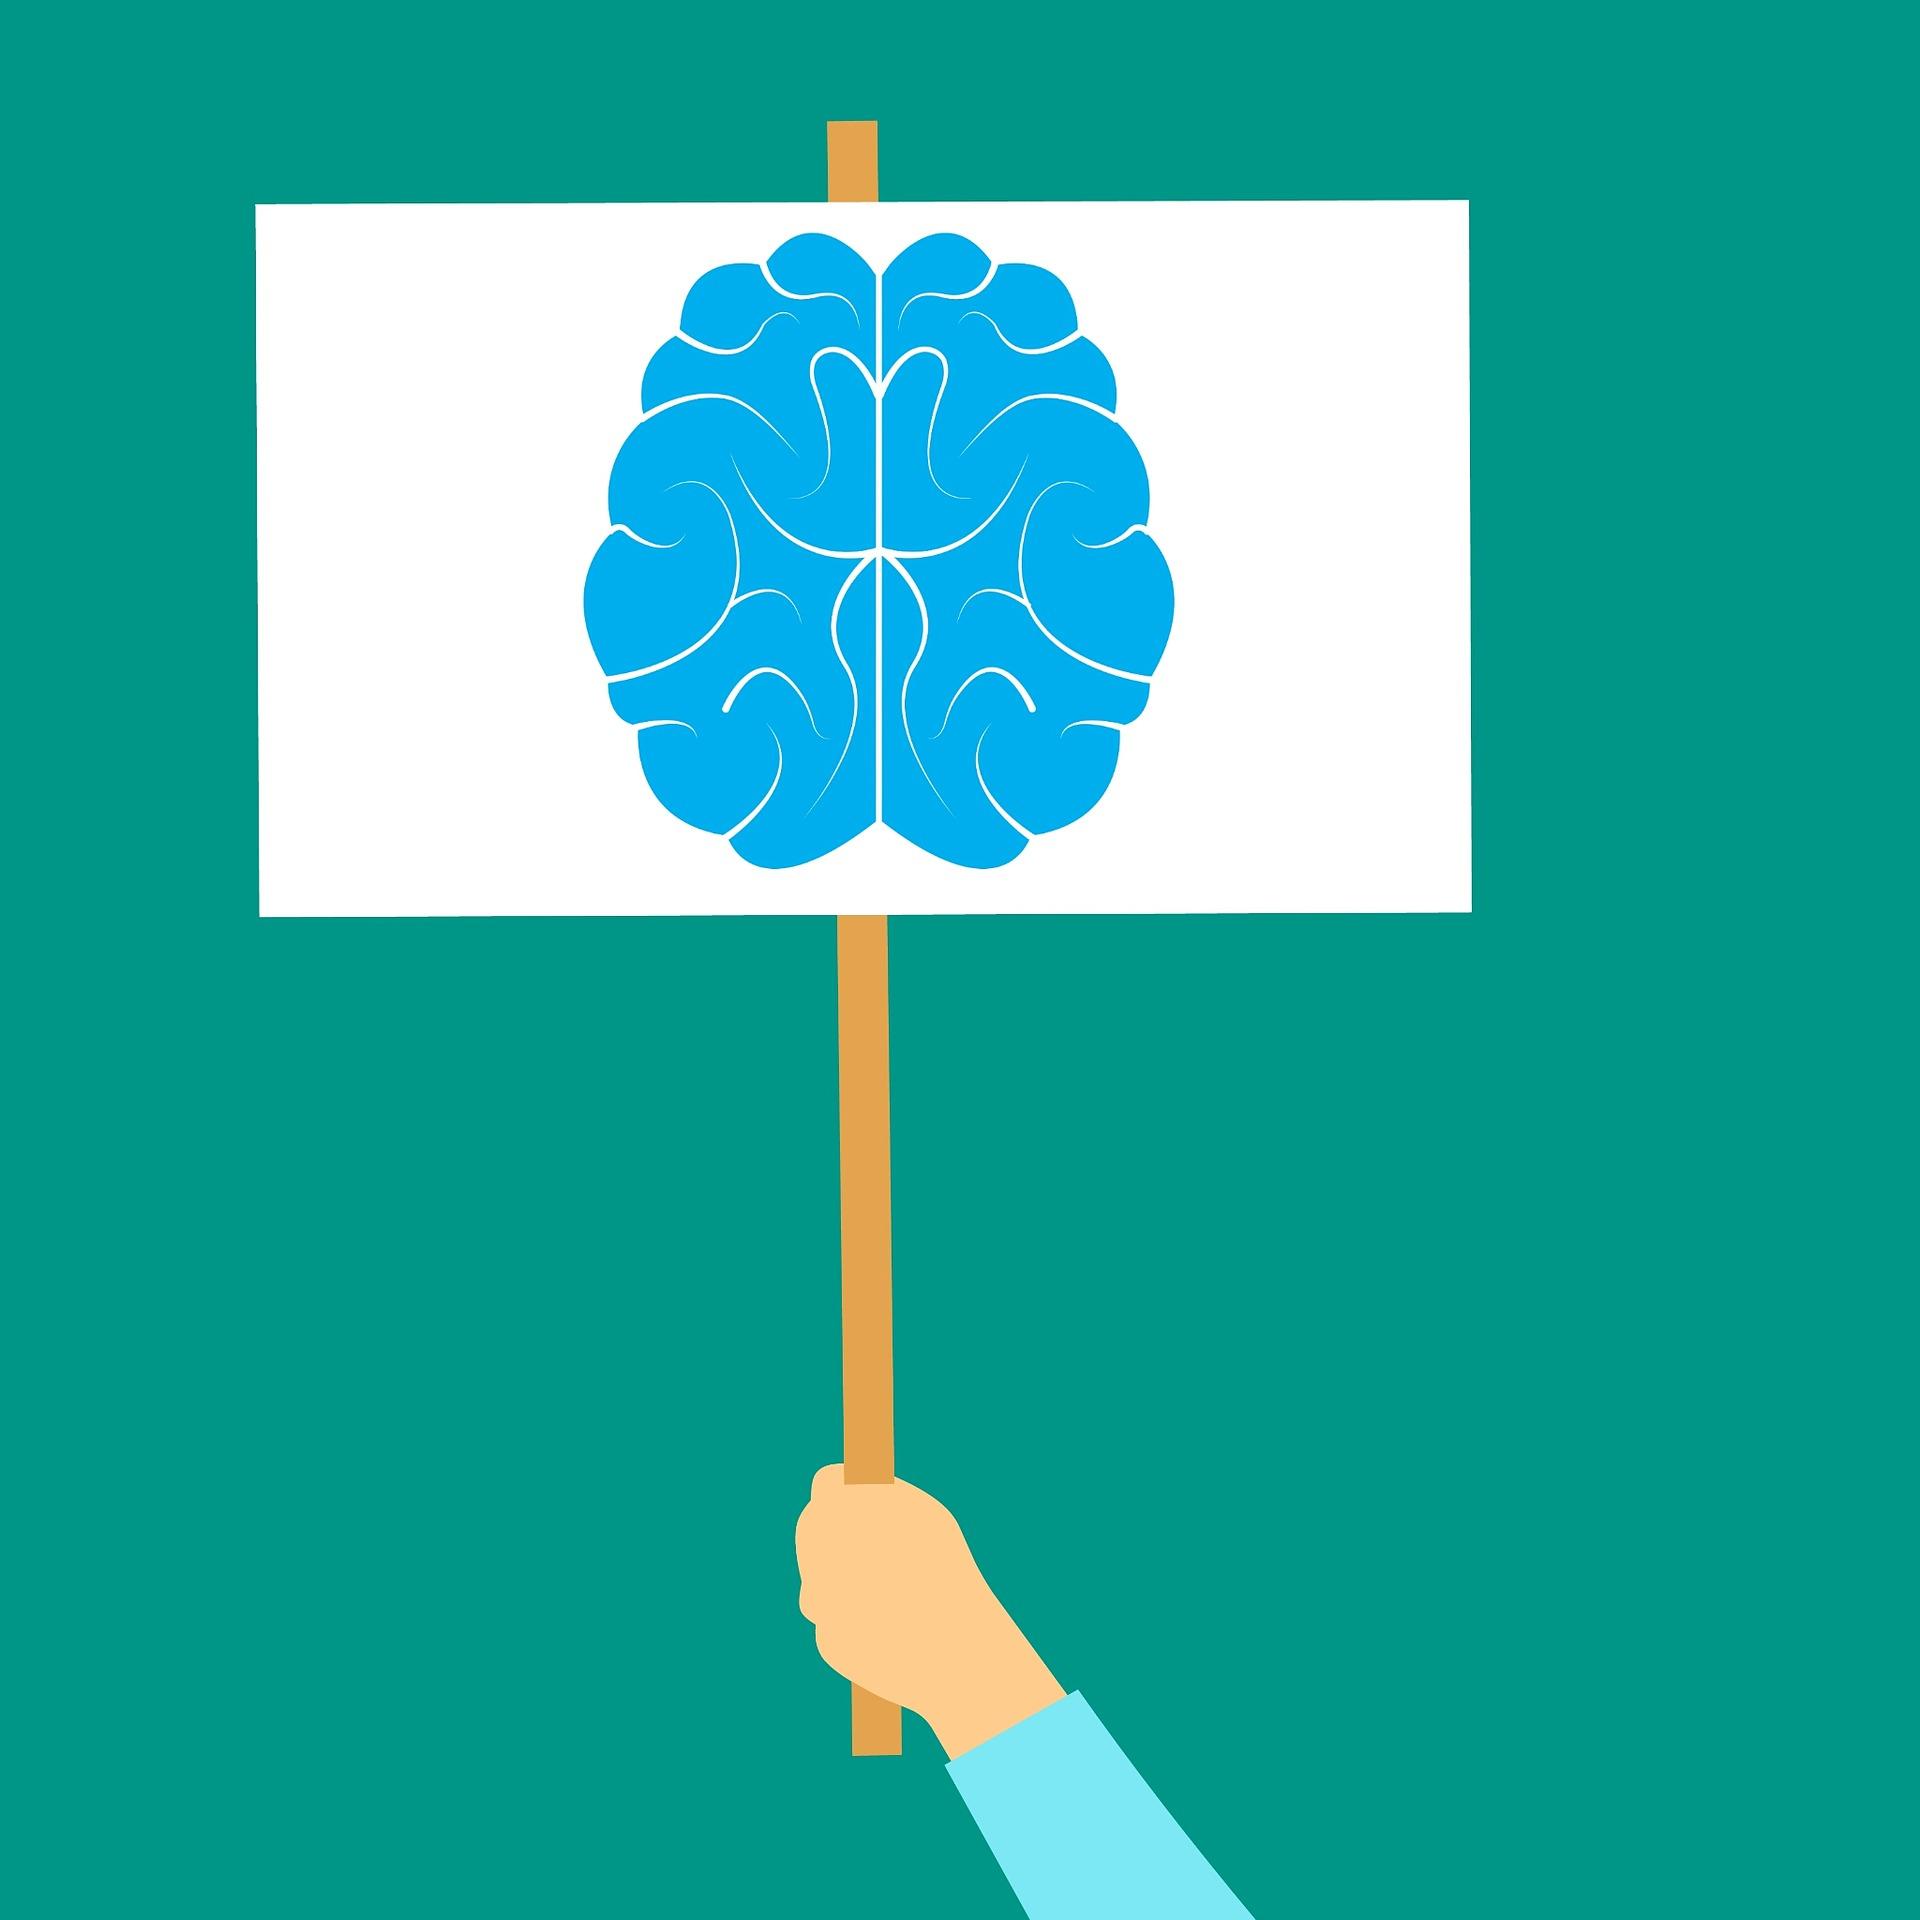 brain-icon-3268442_1920.jpg